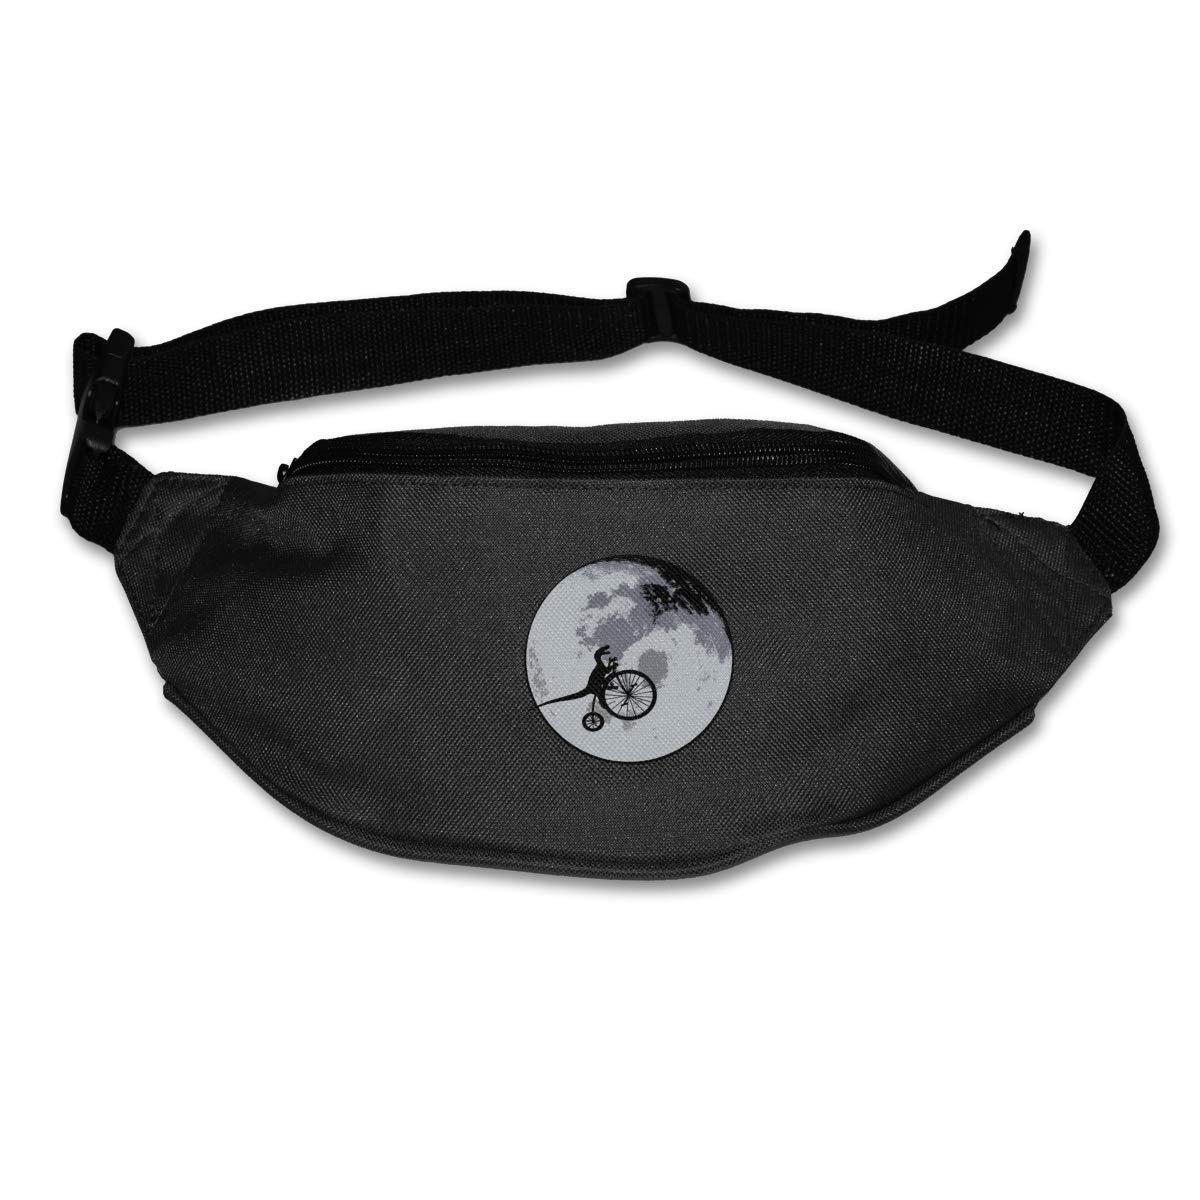 Dinosaur Moon Bike 2 Sport Waist Bag Fanny Pack Adjustable For Hike